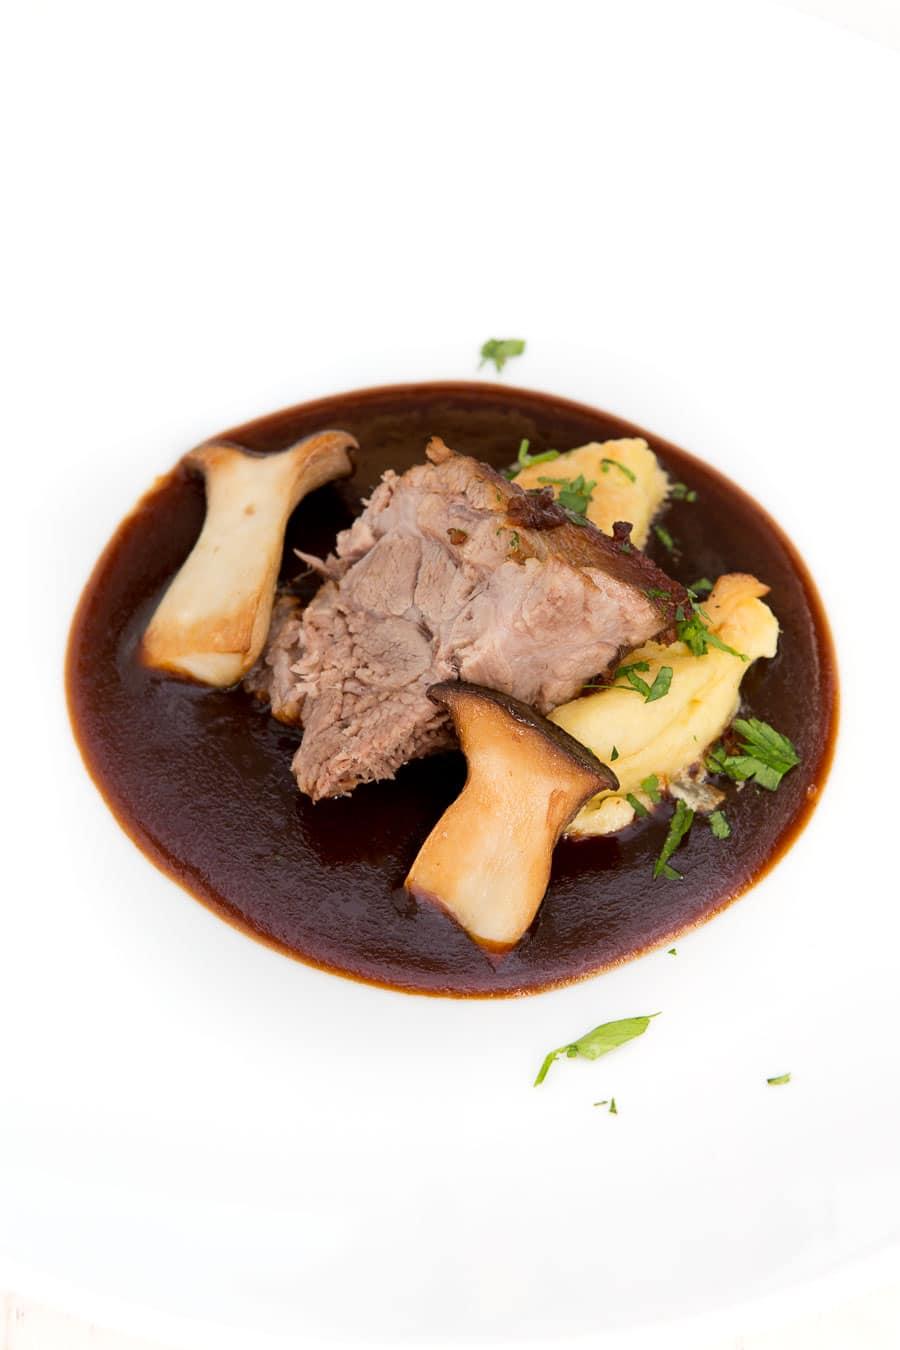 schweinebraten-pariser-gnocchi-pilze-1